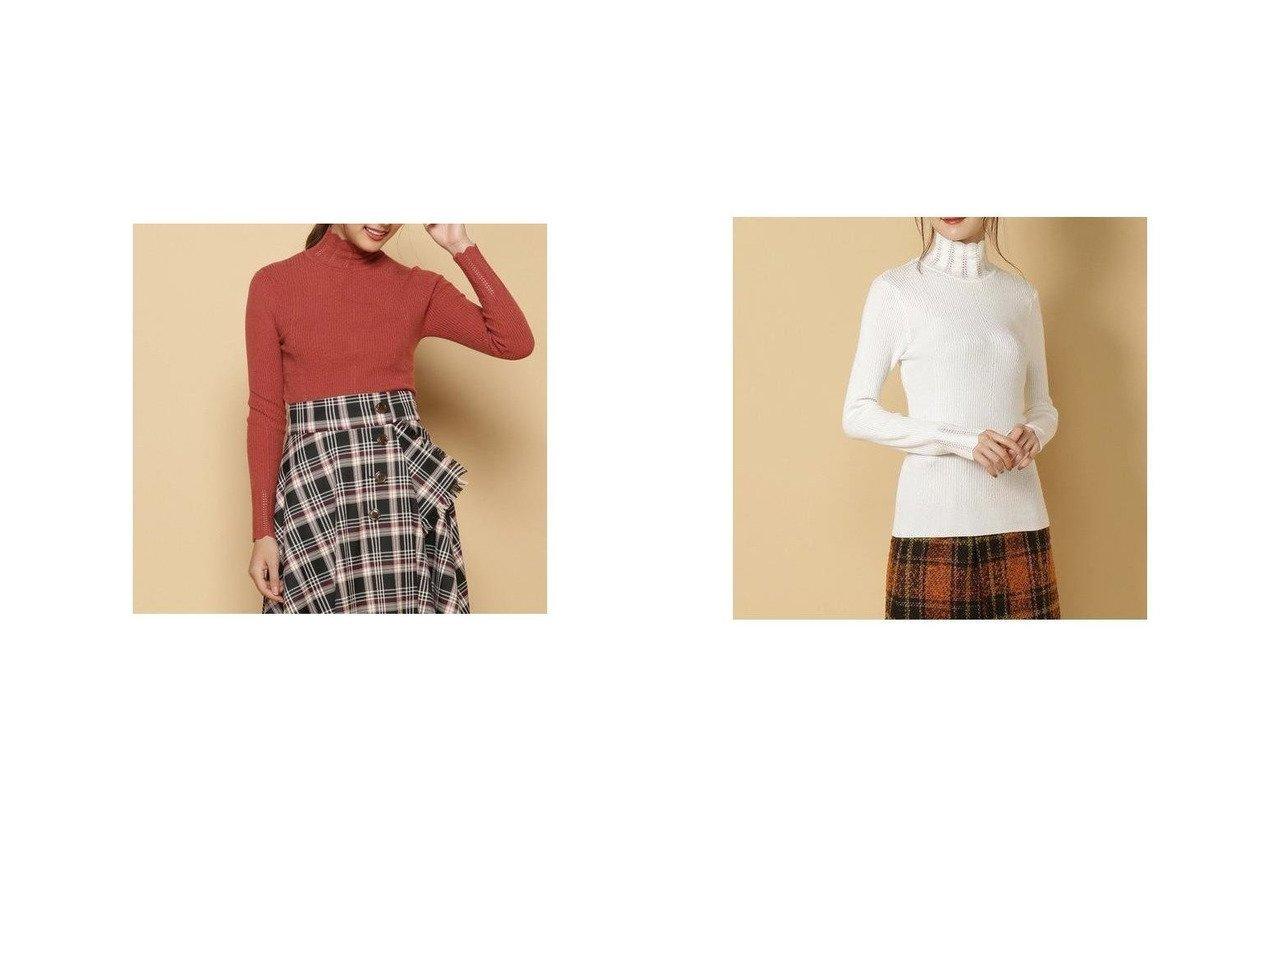 【And Couture/アンドクチュール】のスカラハイネックプルオーバー トップス・カットソーのおすすめ!人気、トレンド・レディースファッションの通販 おすすめで人気の流行・トレンド、ファッションの通販商品 メンズファッション・キッズファッション・インテリア・家具・レディースファッション・服の通販 founy(ファニー) https://founy.com/ ファッション Fashion レディースファッション WOMEN トップス カットソー Tops Tshirt ニット Knit Tops プルオーバー Pullover セーター ハイネック 再入荷 Restock/Back in Stock/Re Arrival  ID:crp329100000022948